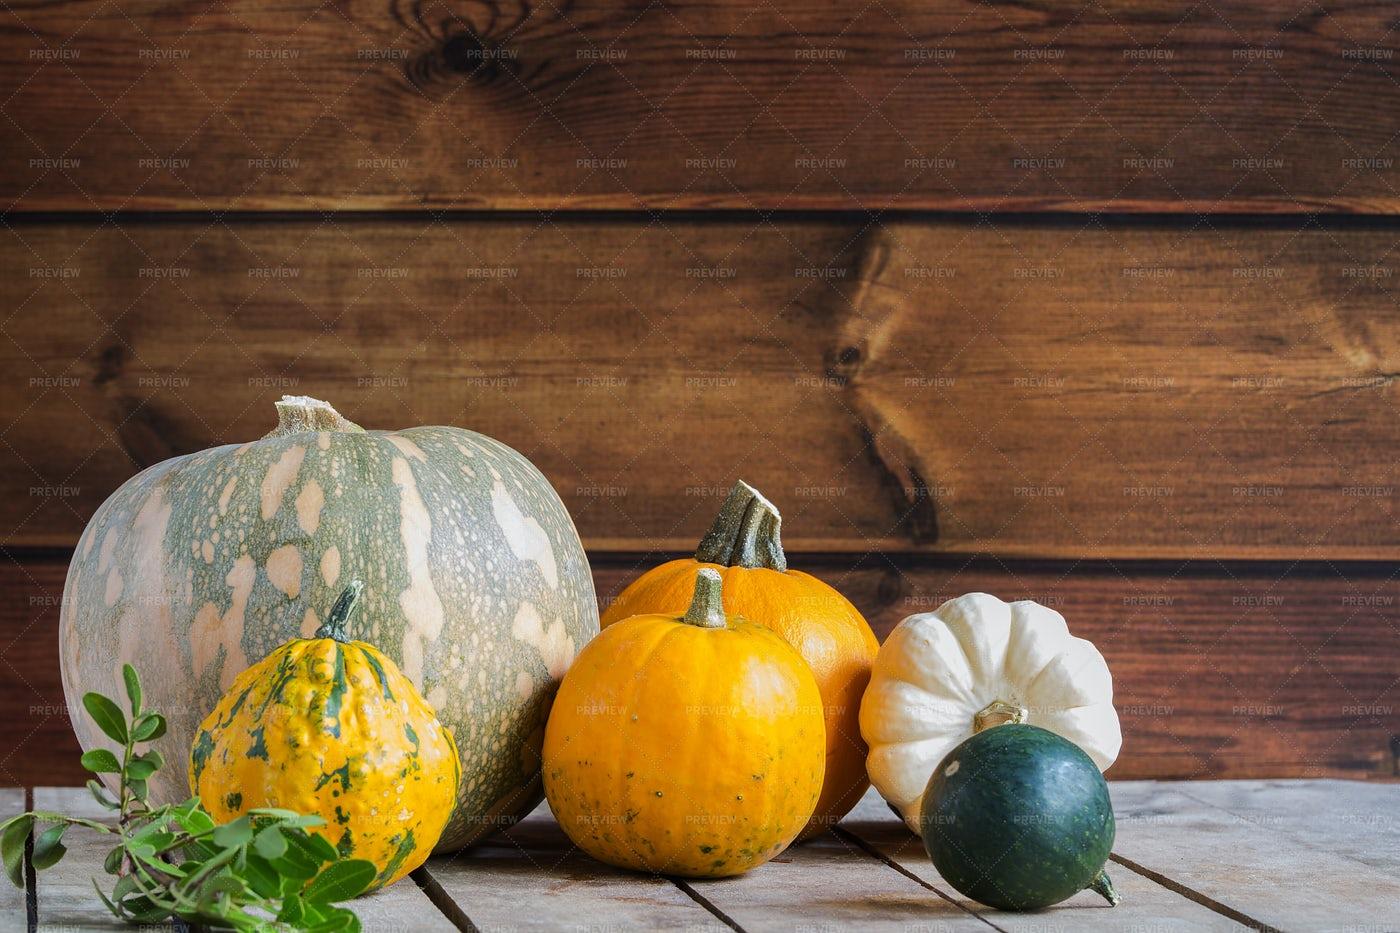 Pumpkins Against Wood: Stock Photos